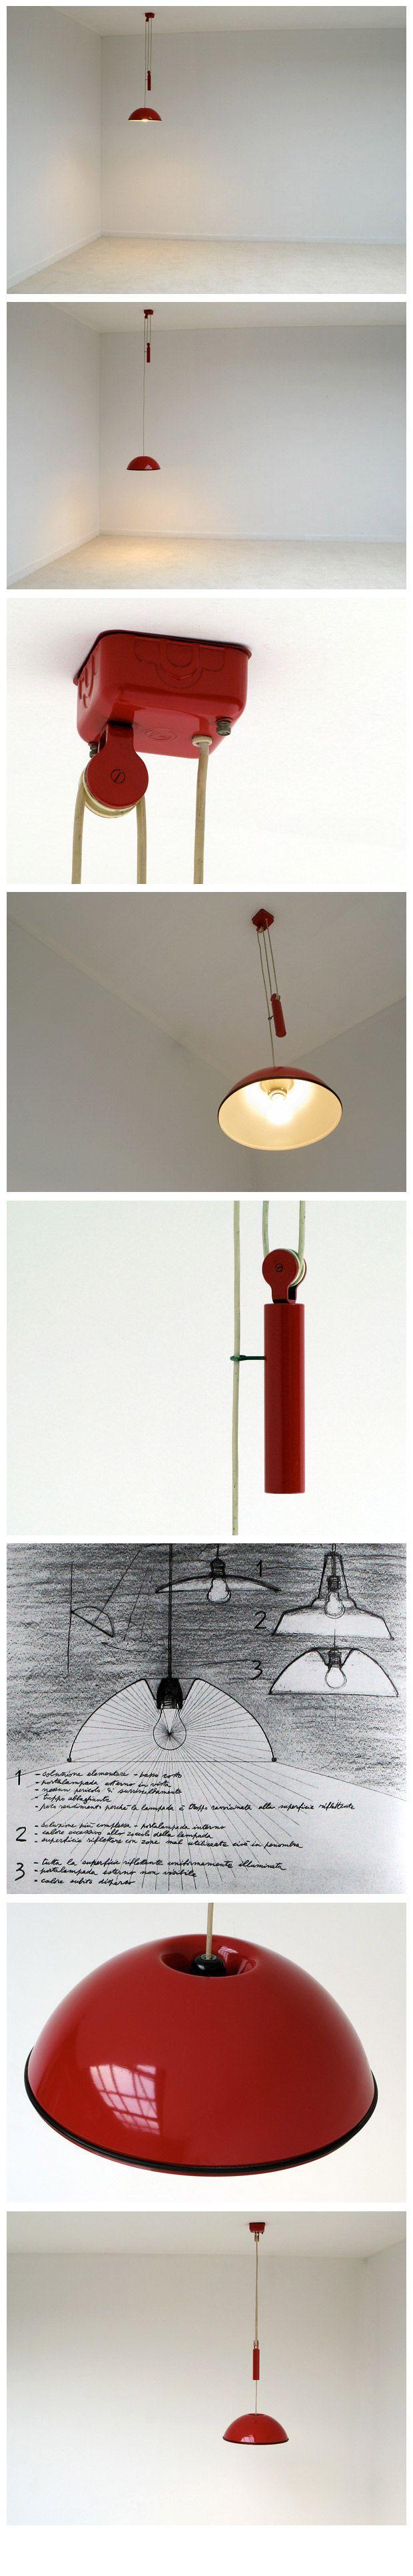 PIER GIACOMO CASTIGLIONI e ACHILLE lampada RELEMME by FLOS sketch and handwrithing by PIER GIACOMO CASTIGLIONI